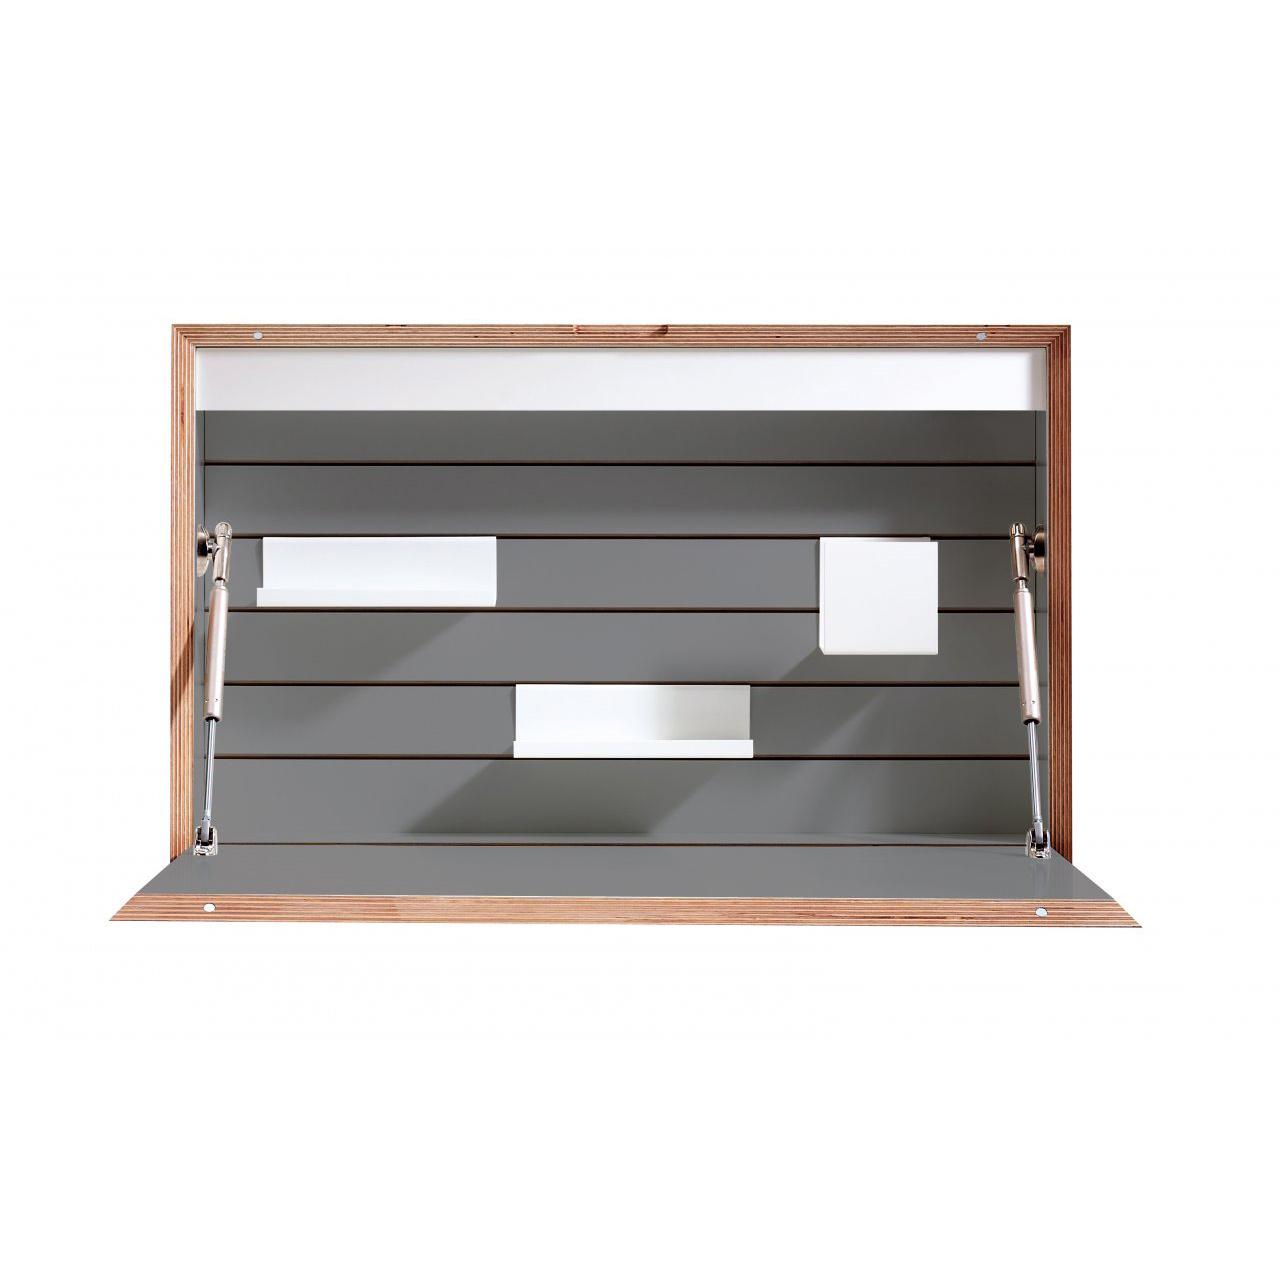 Hänge-Sekretär Flatbox Müller Möbelwerkstätten